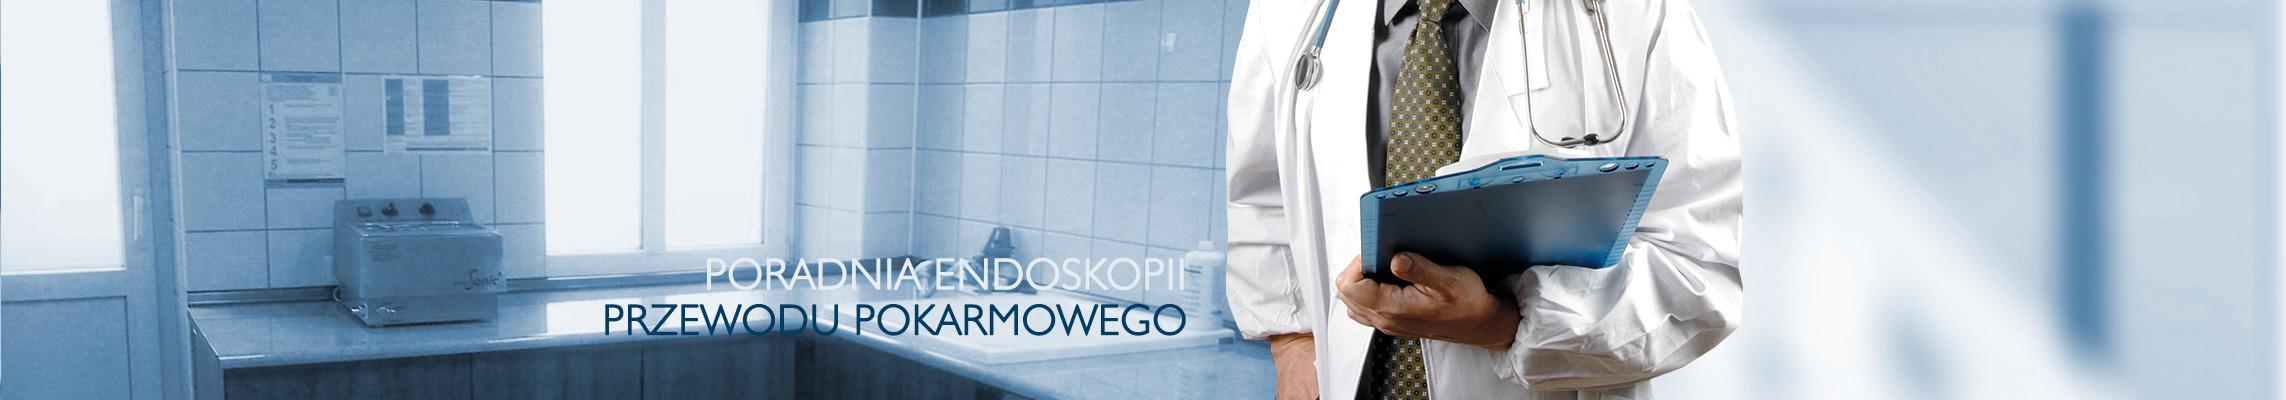 poradnia-endoskopii